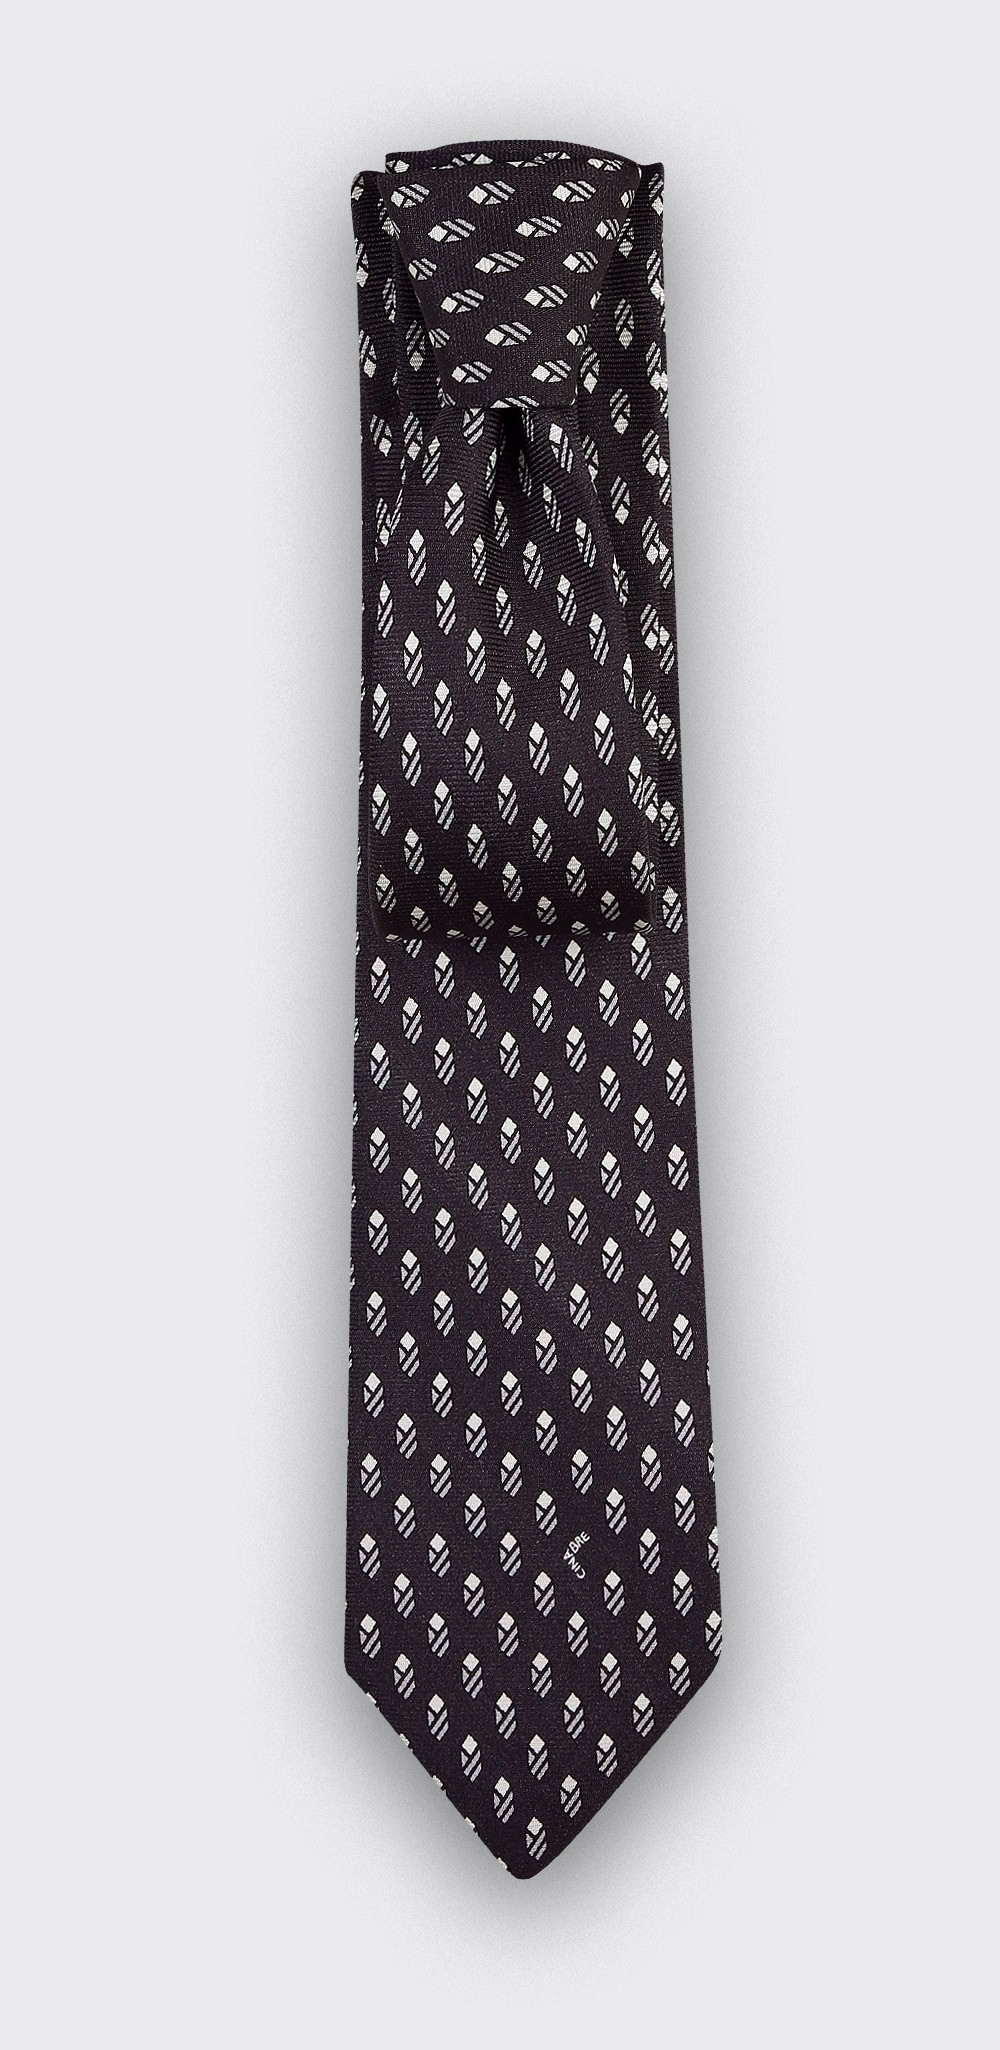 Cravate Grand Pan Anthracite - Cinabre Paris